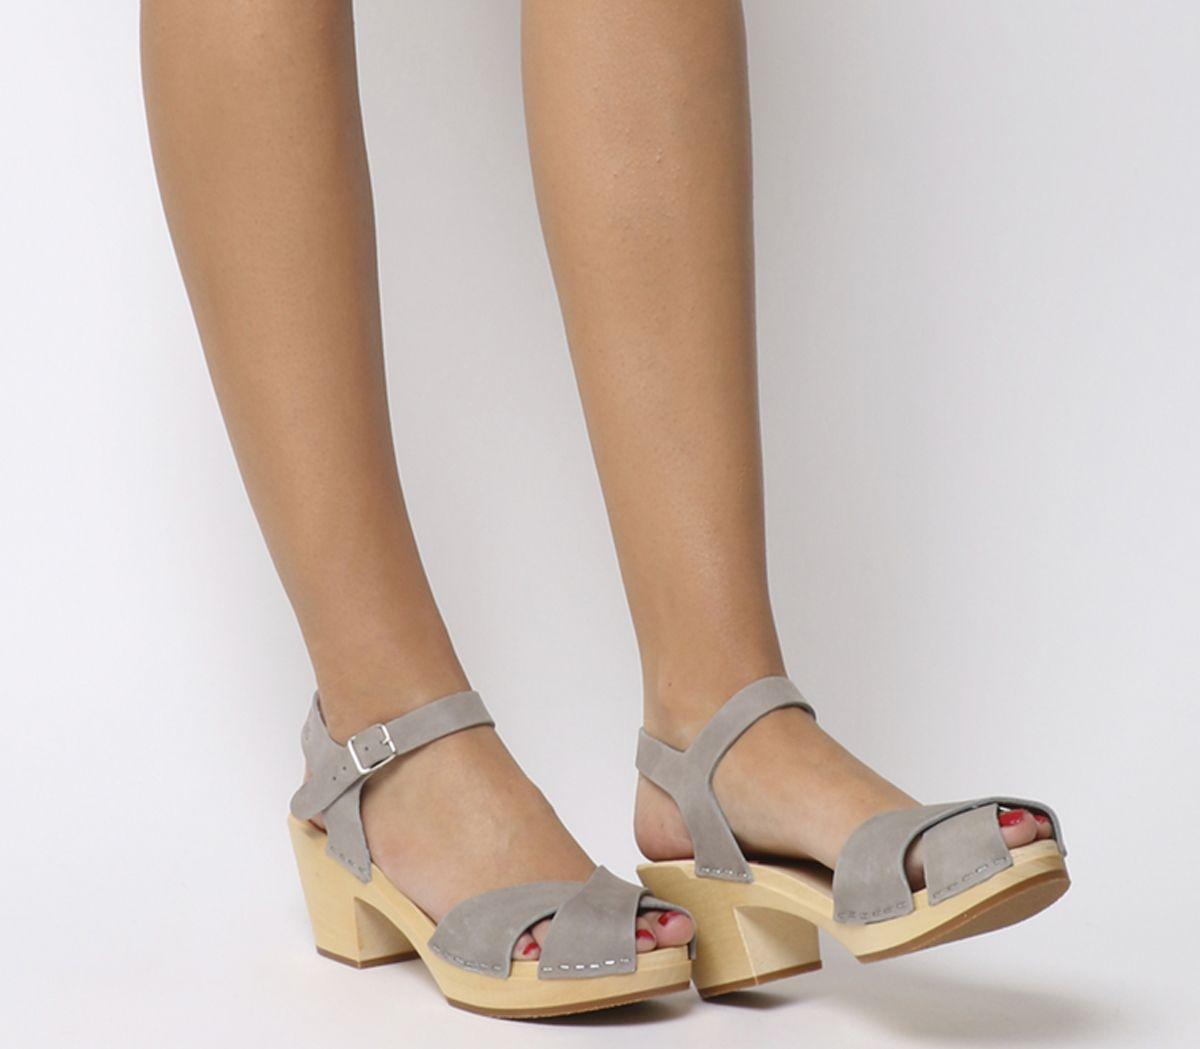 979601e474c Swedish Hasbeens Mirja Mid Heel Sandals Grey Nubuck - Mid Heels